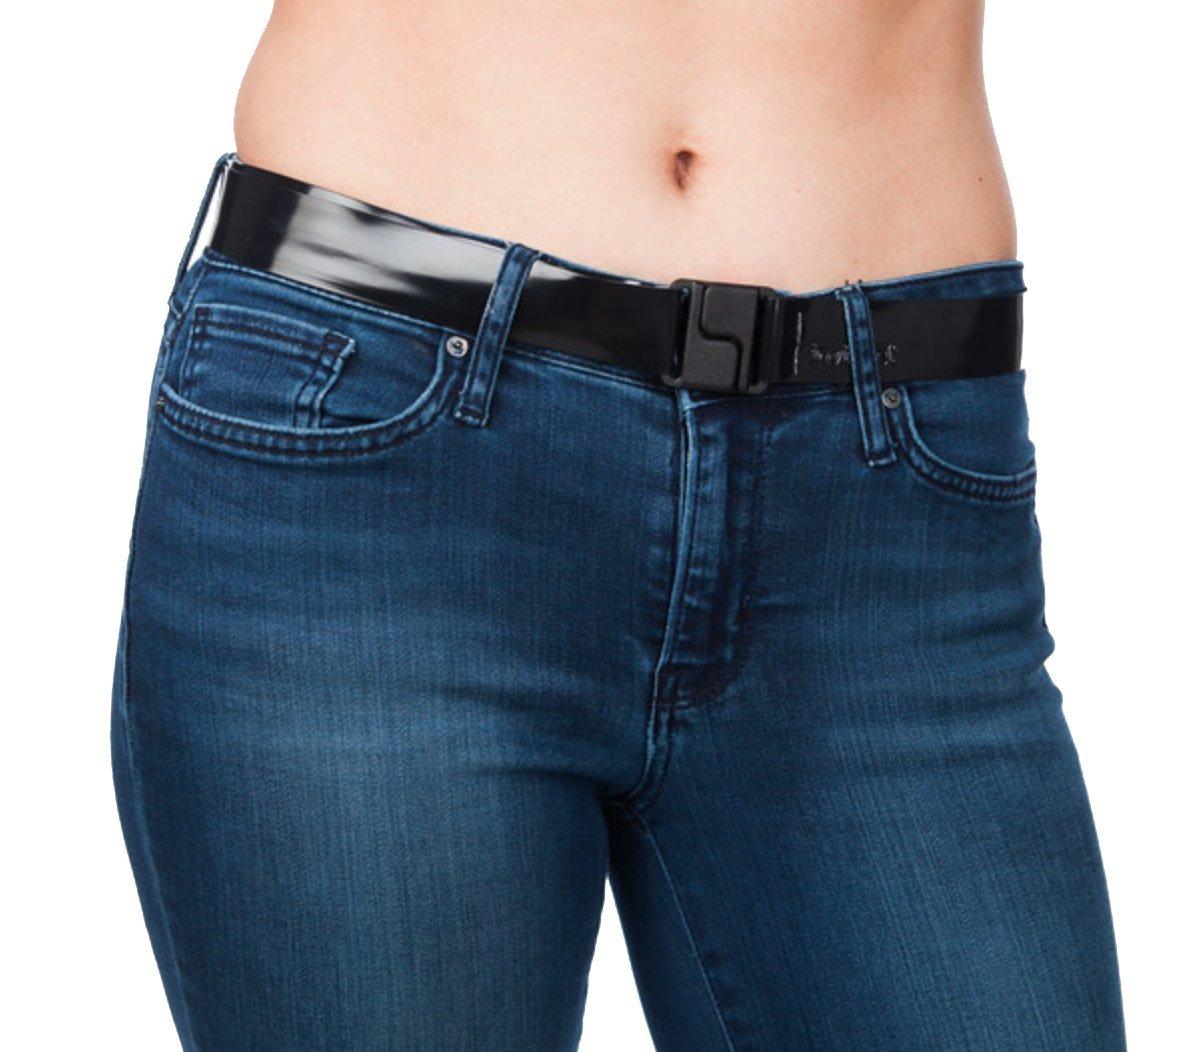 Invisibelt Skinny Lay Flat Women's Belt, Plus-Size Black